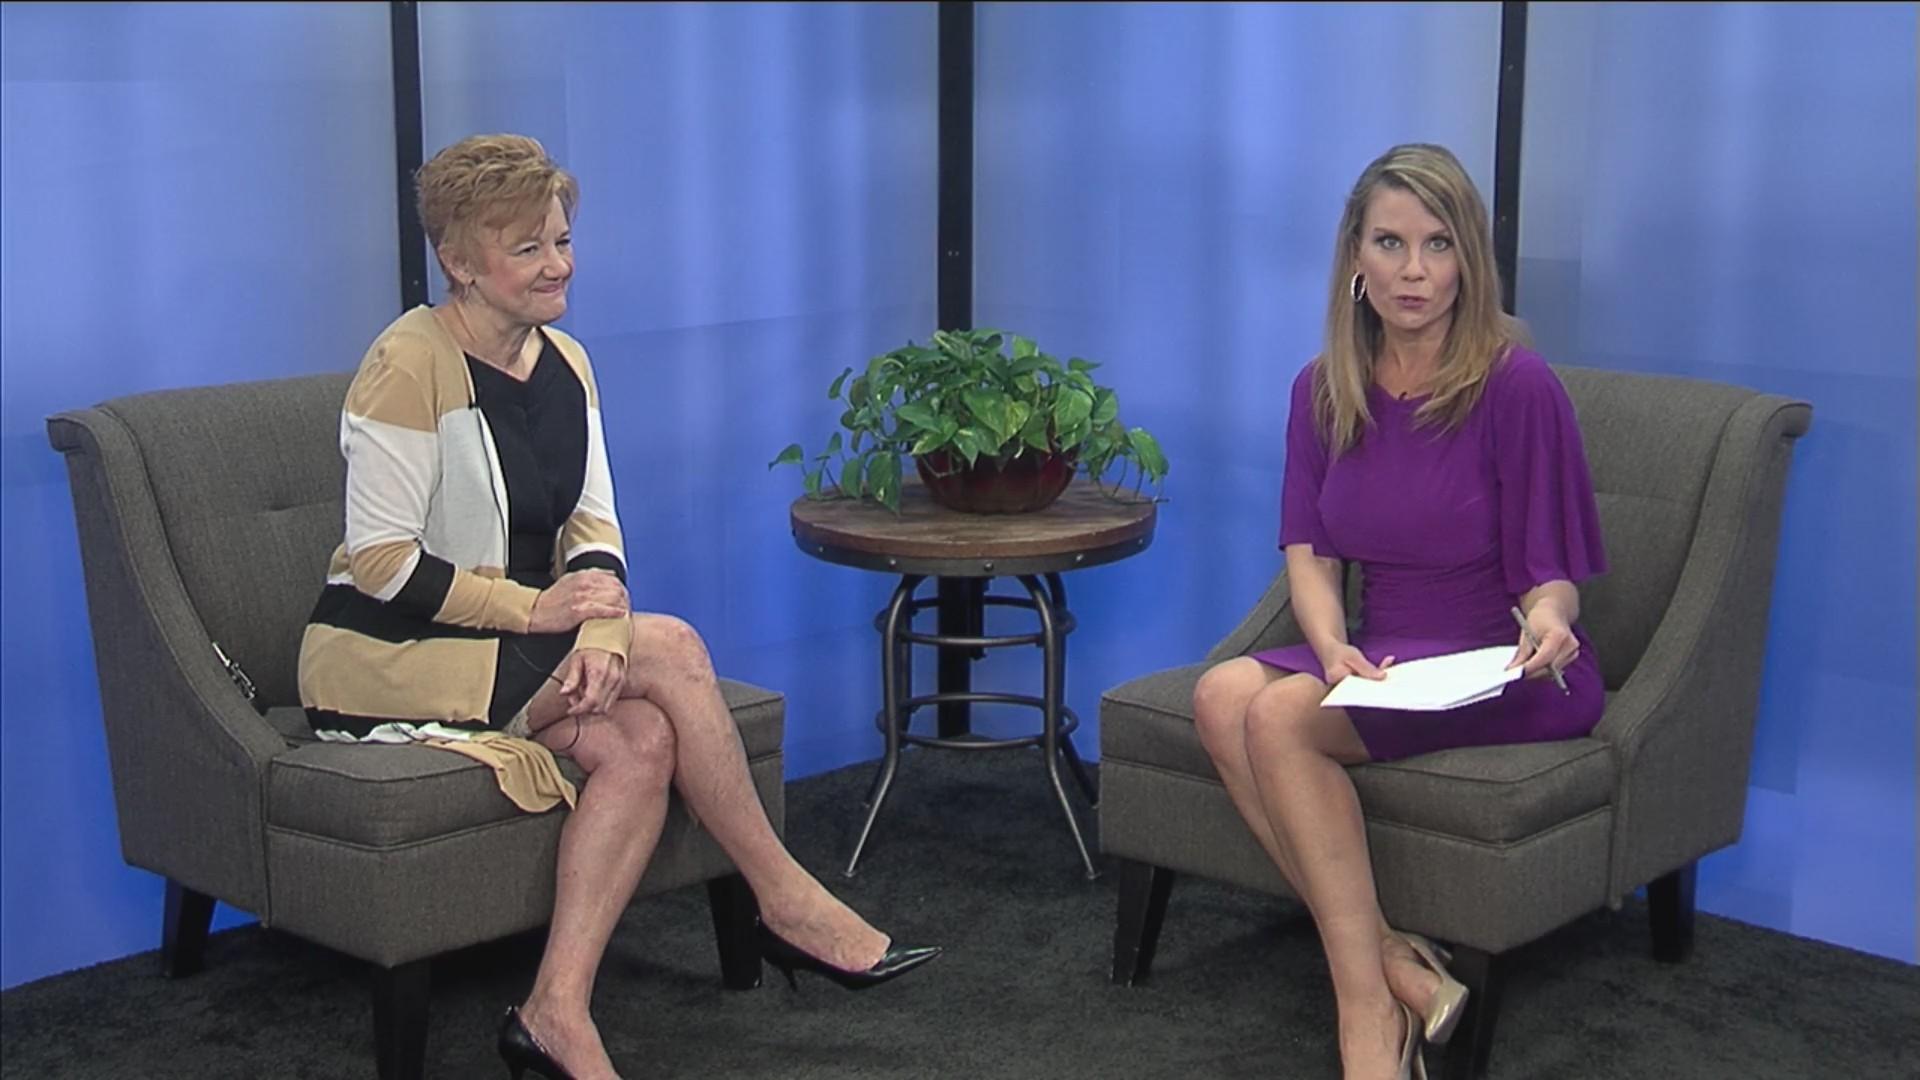 Southeast Health launches new cuddler program